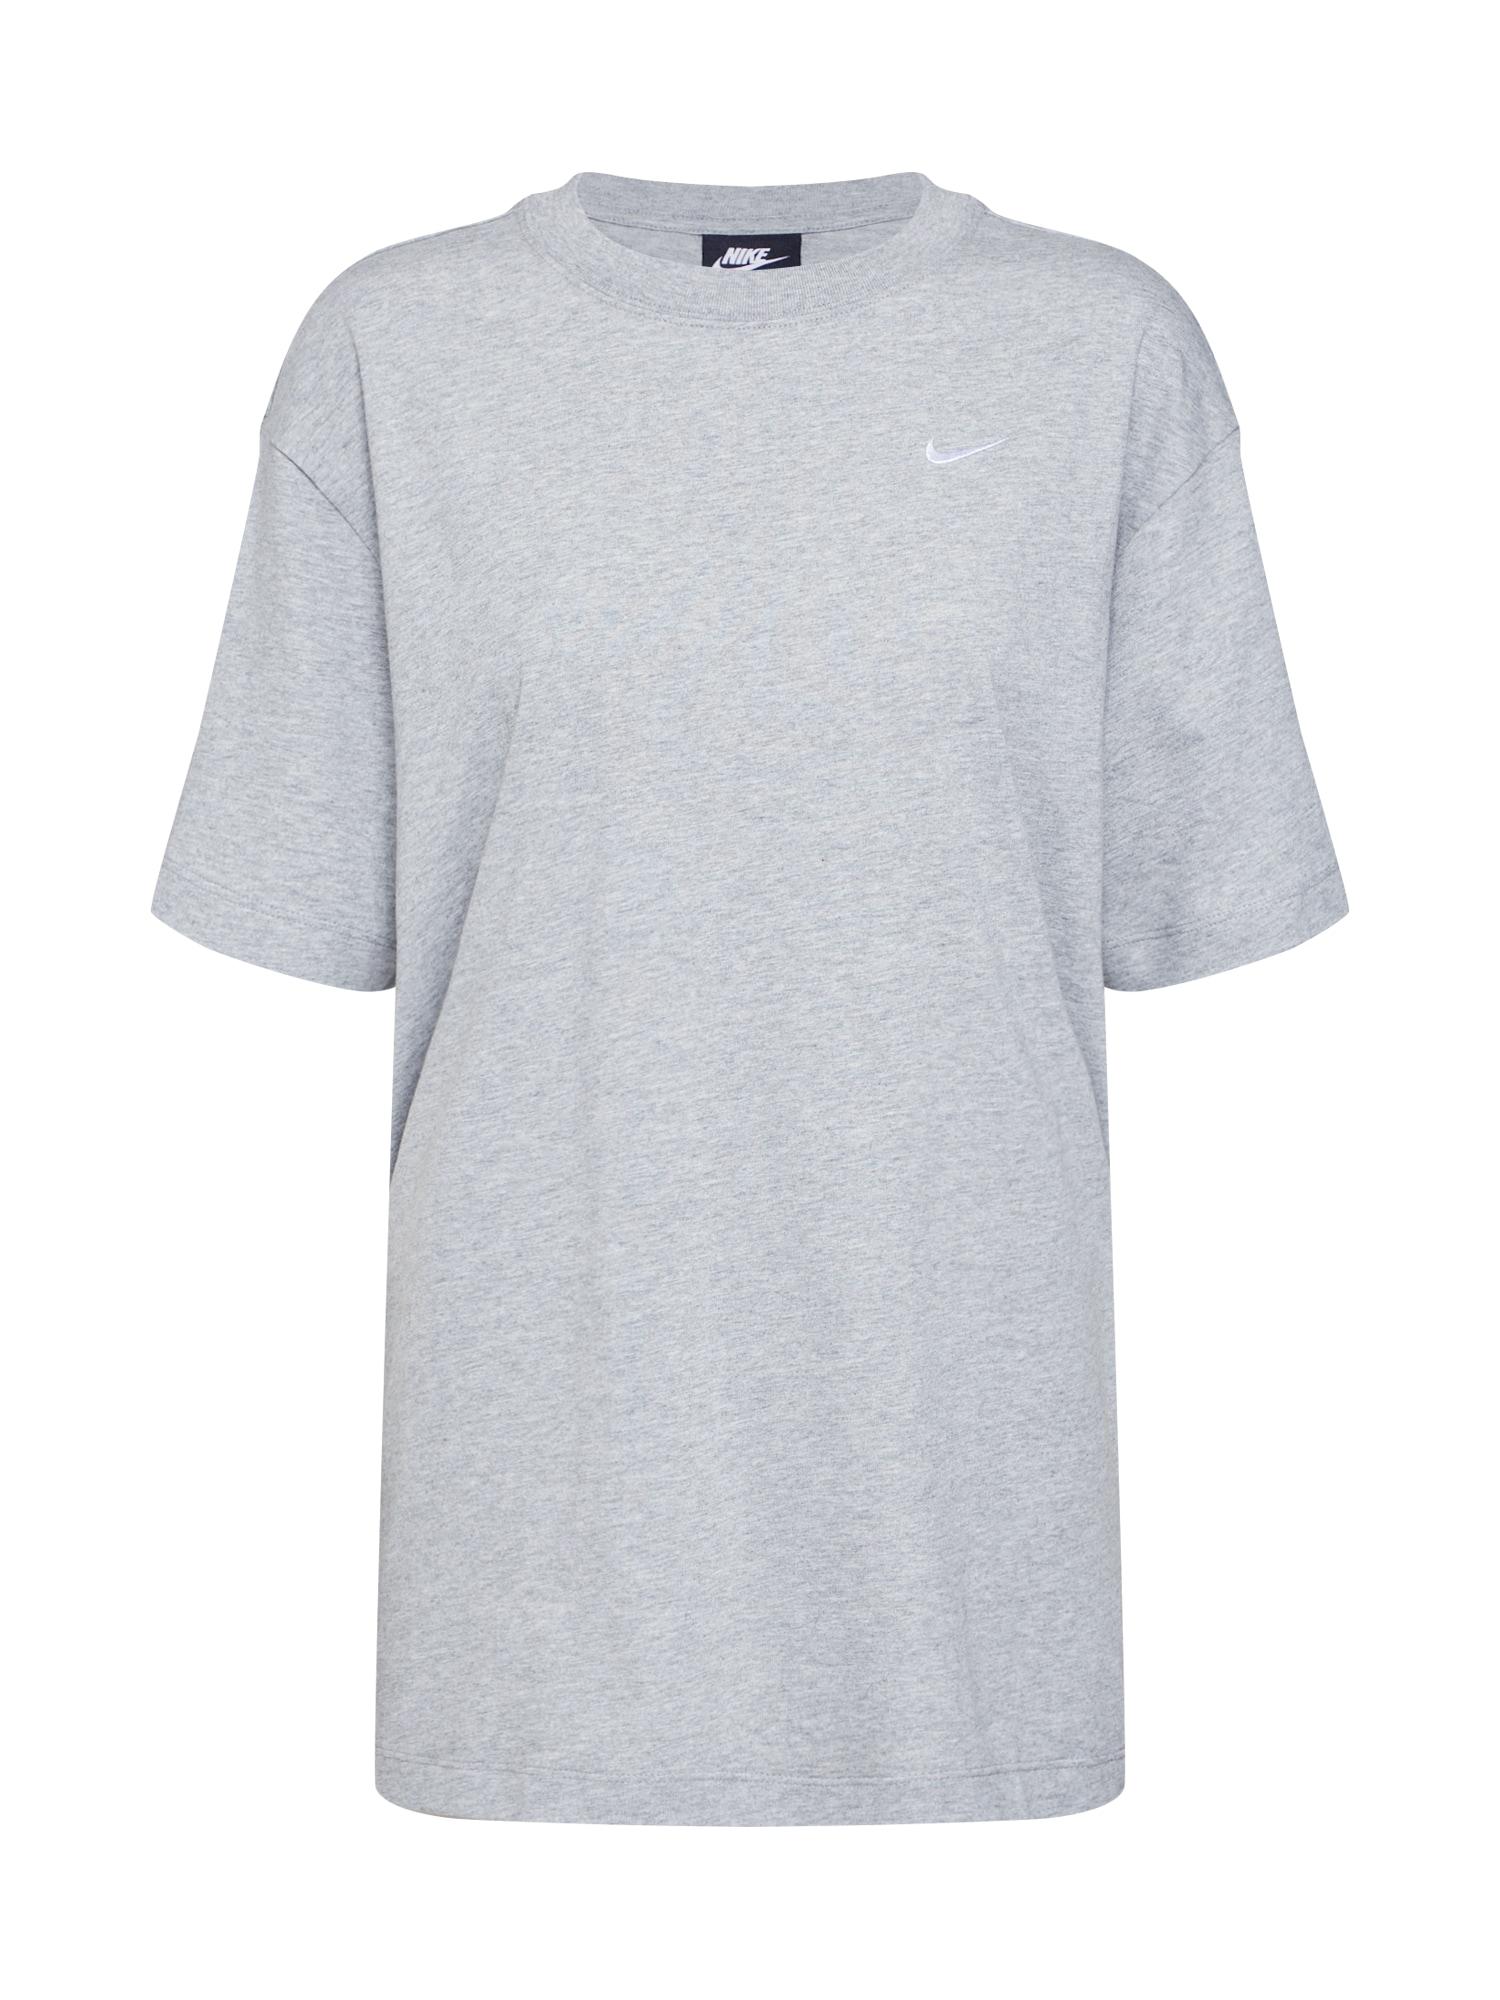 Oversized tričko ESSNTL šedá bílá Nike Sportswear